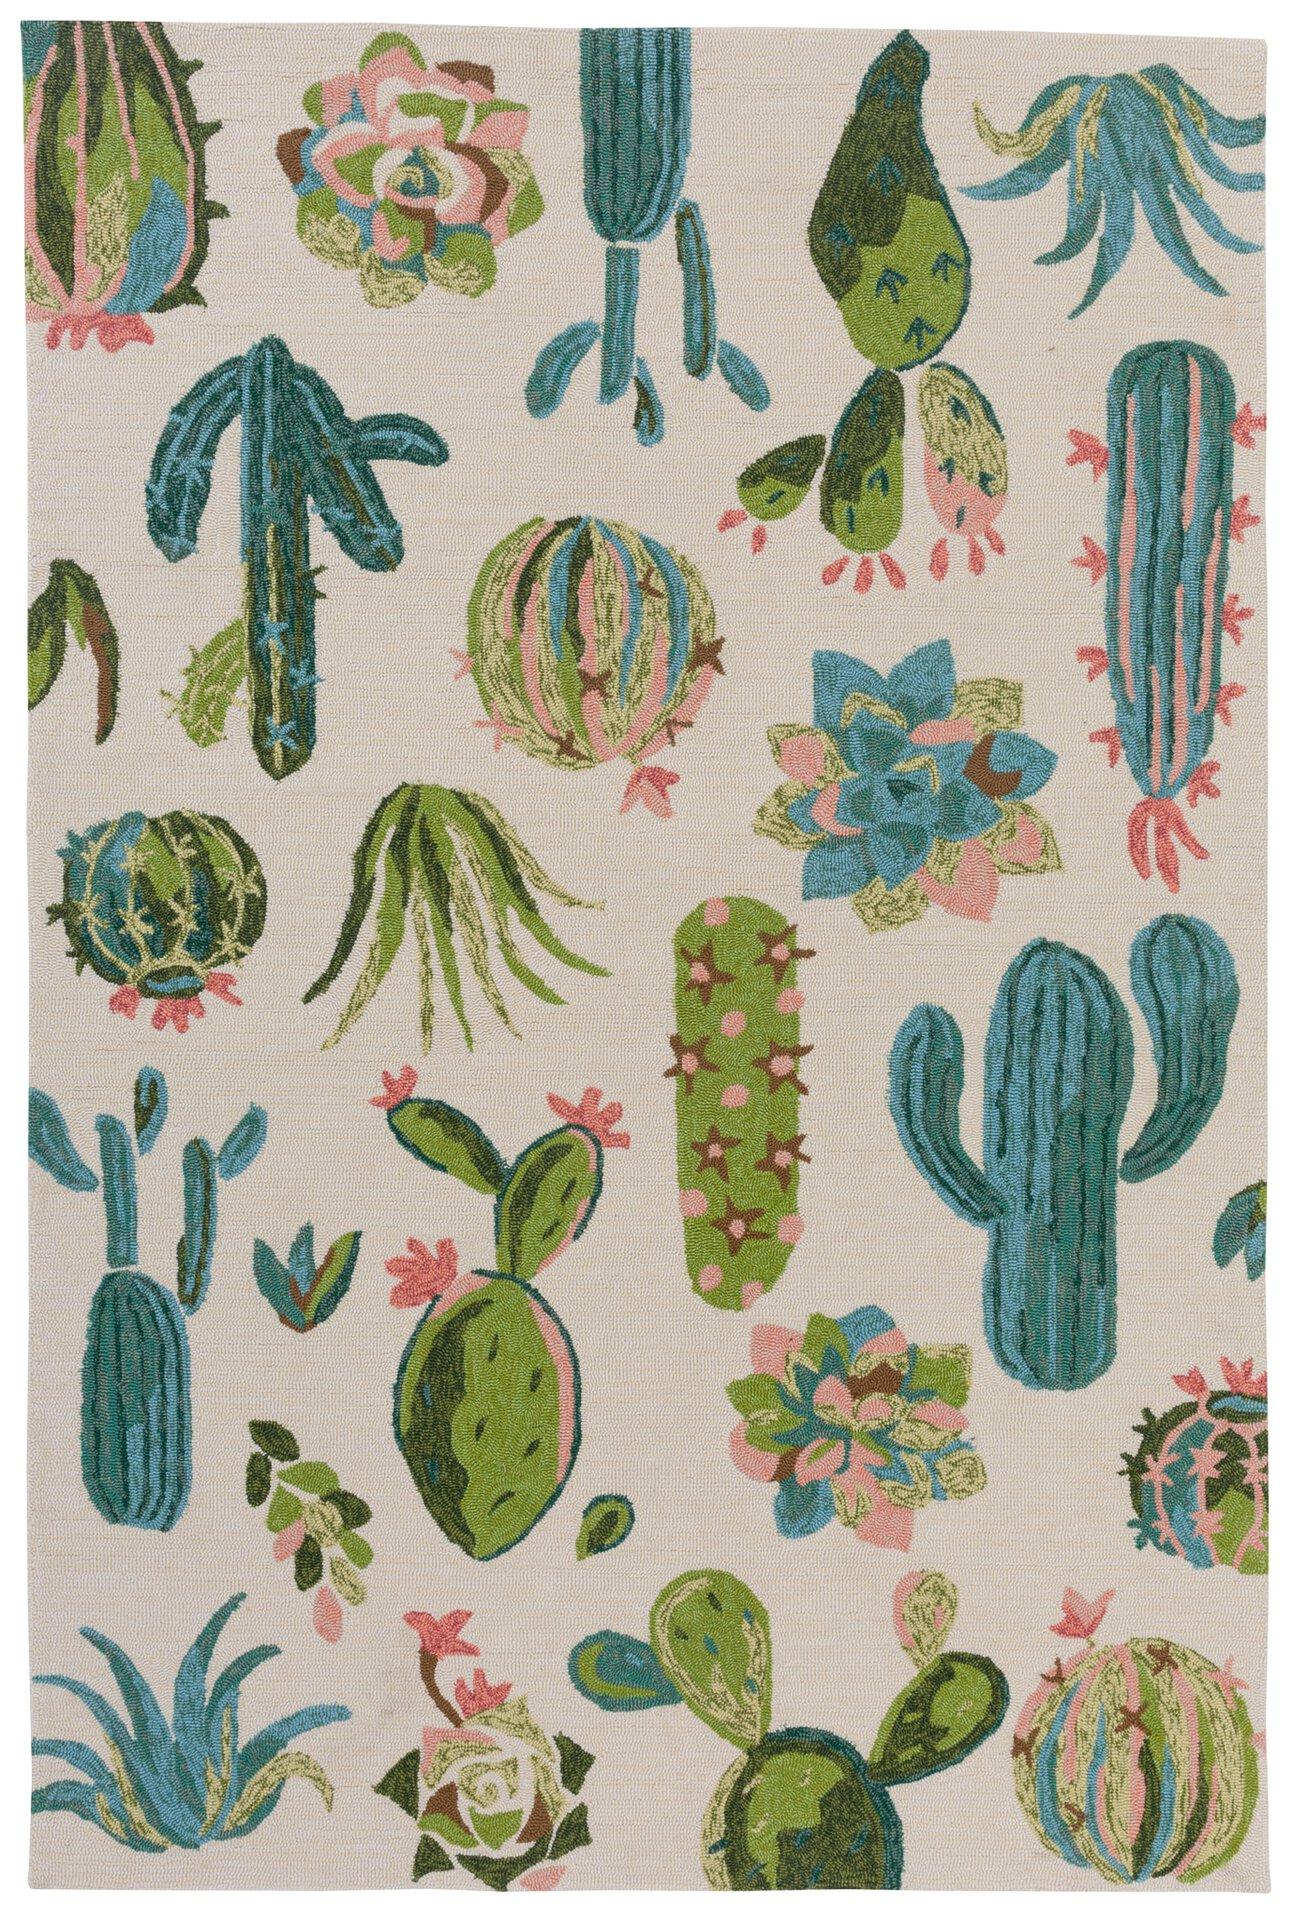 Handtuftteppich Rosetta Gino Falcone Textil weiß